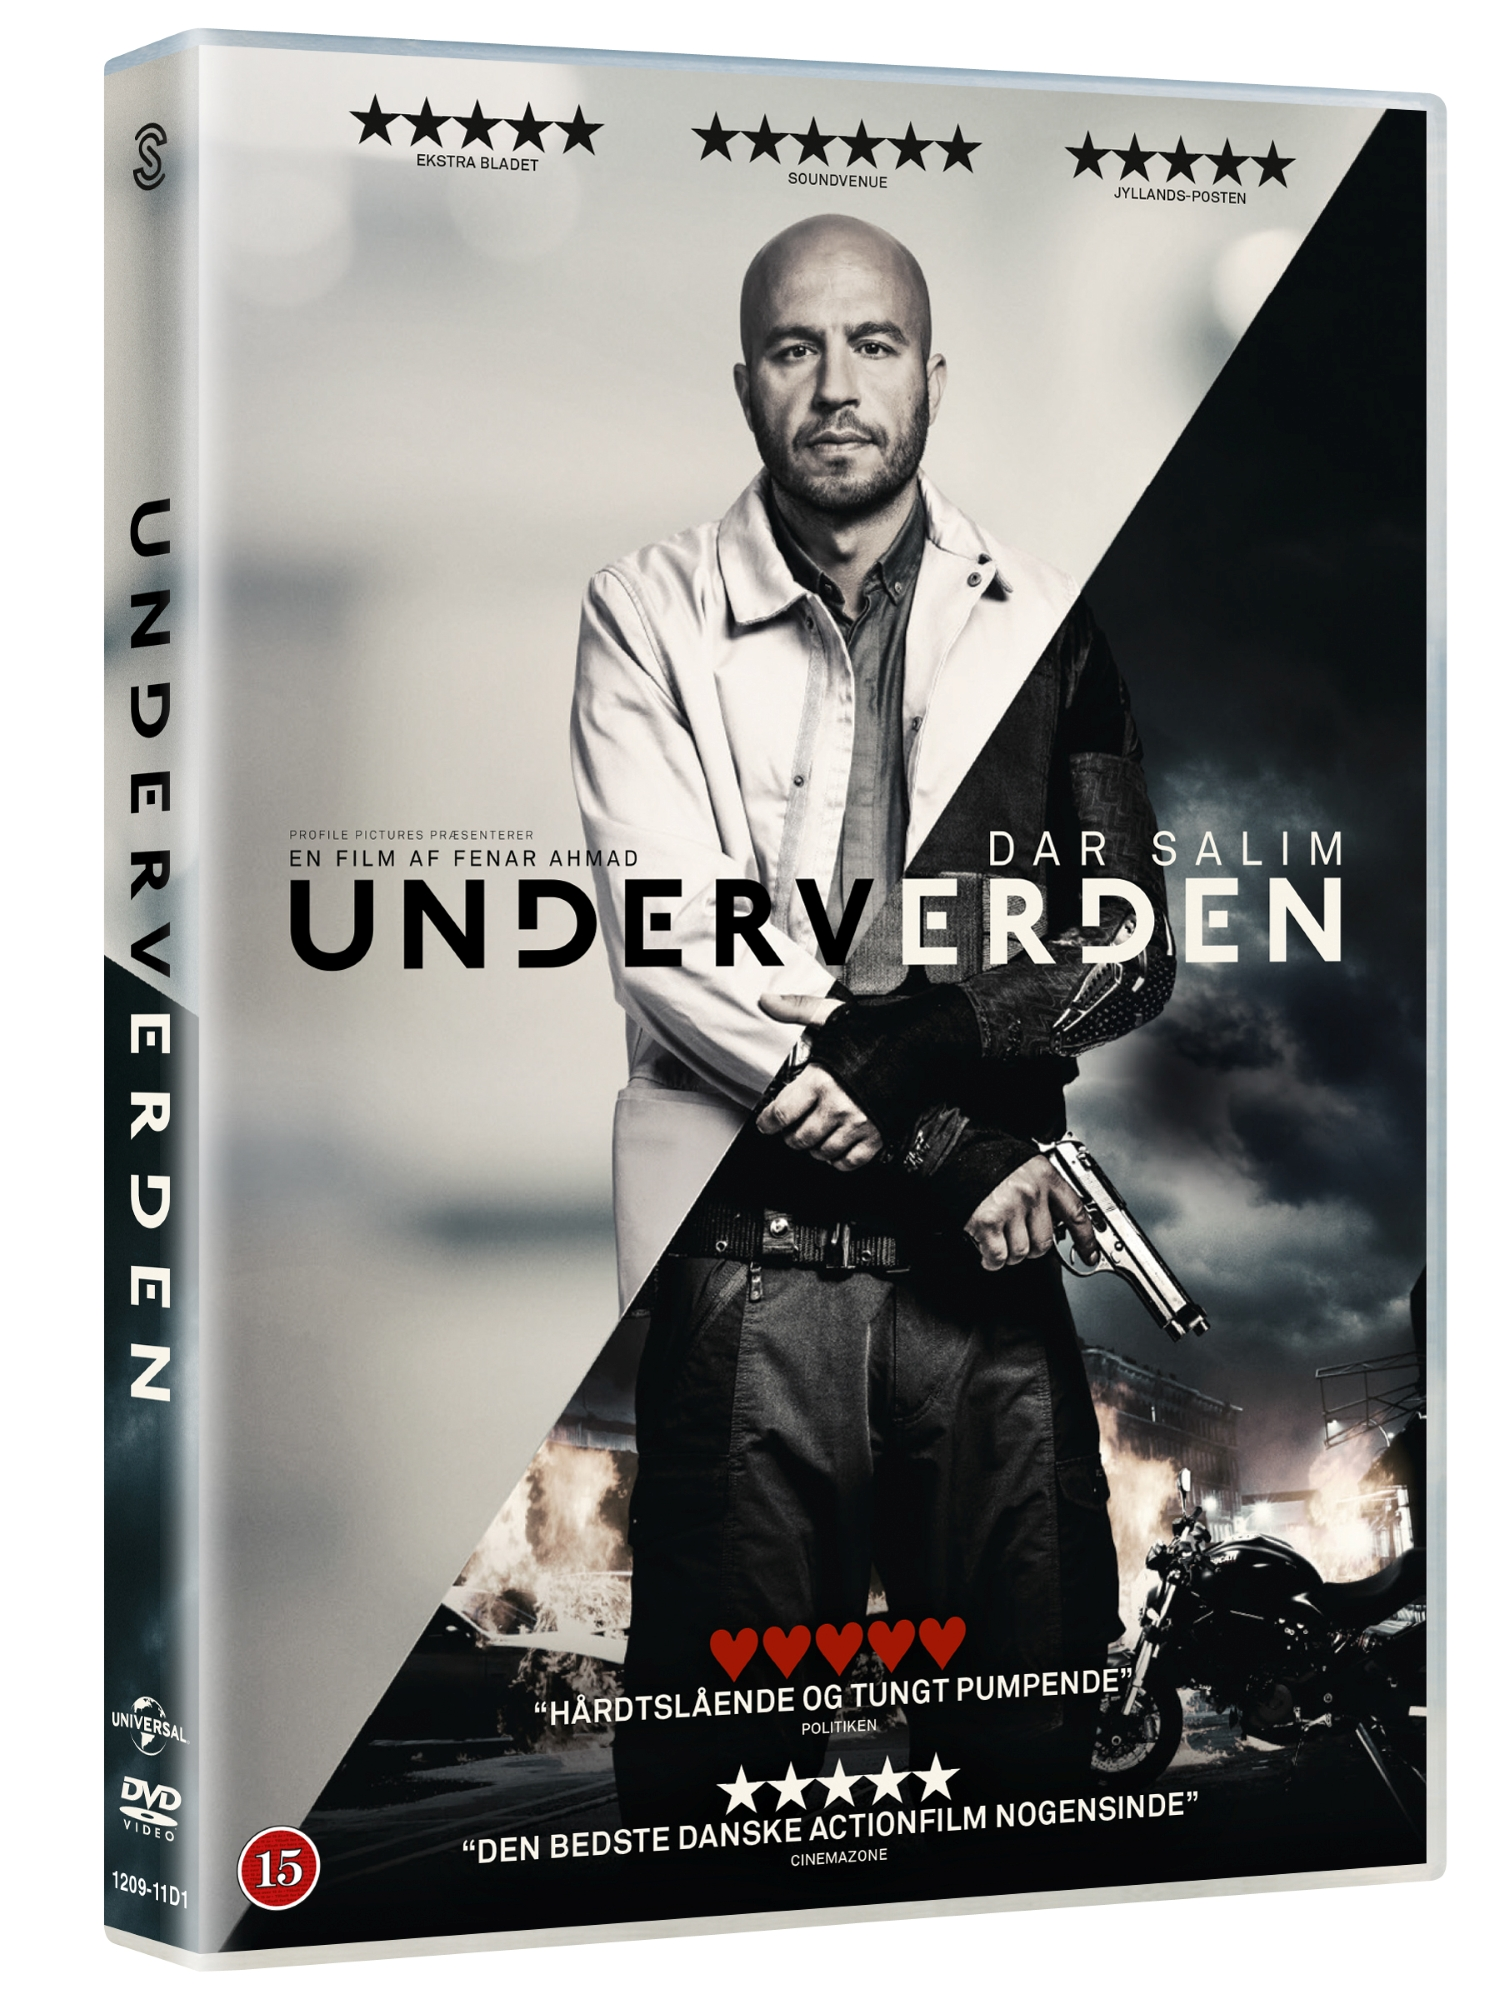 Underverden - Dar Salim - Film - JV-UPN - 5706168999068 - 1/6-2017